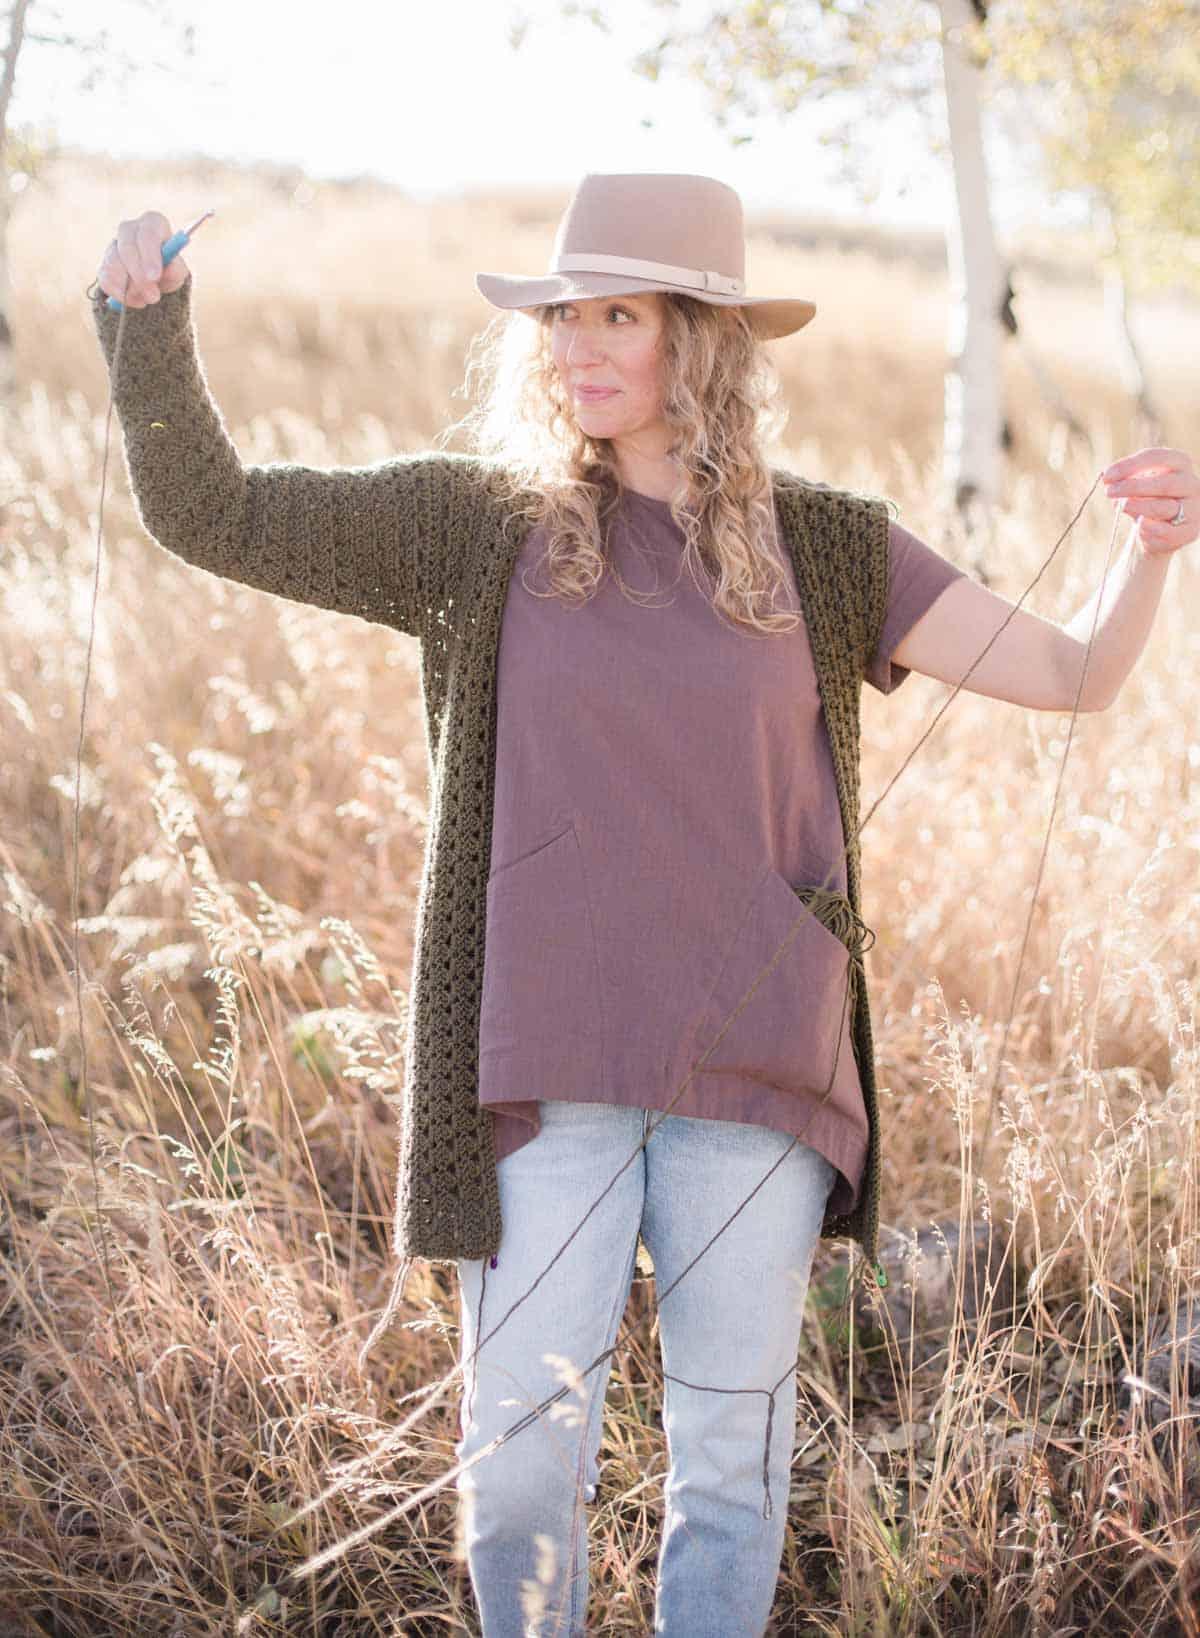 Jess Coppom, a crochet blogger, wearing a half-finished crochet sweater.